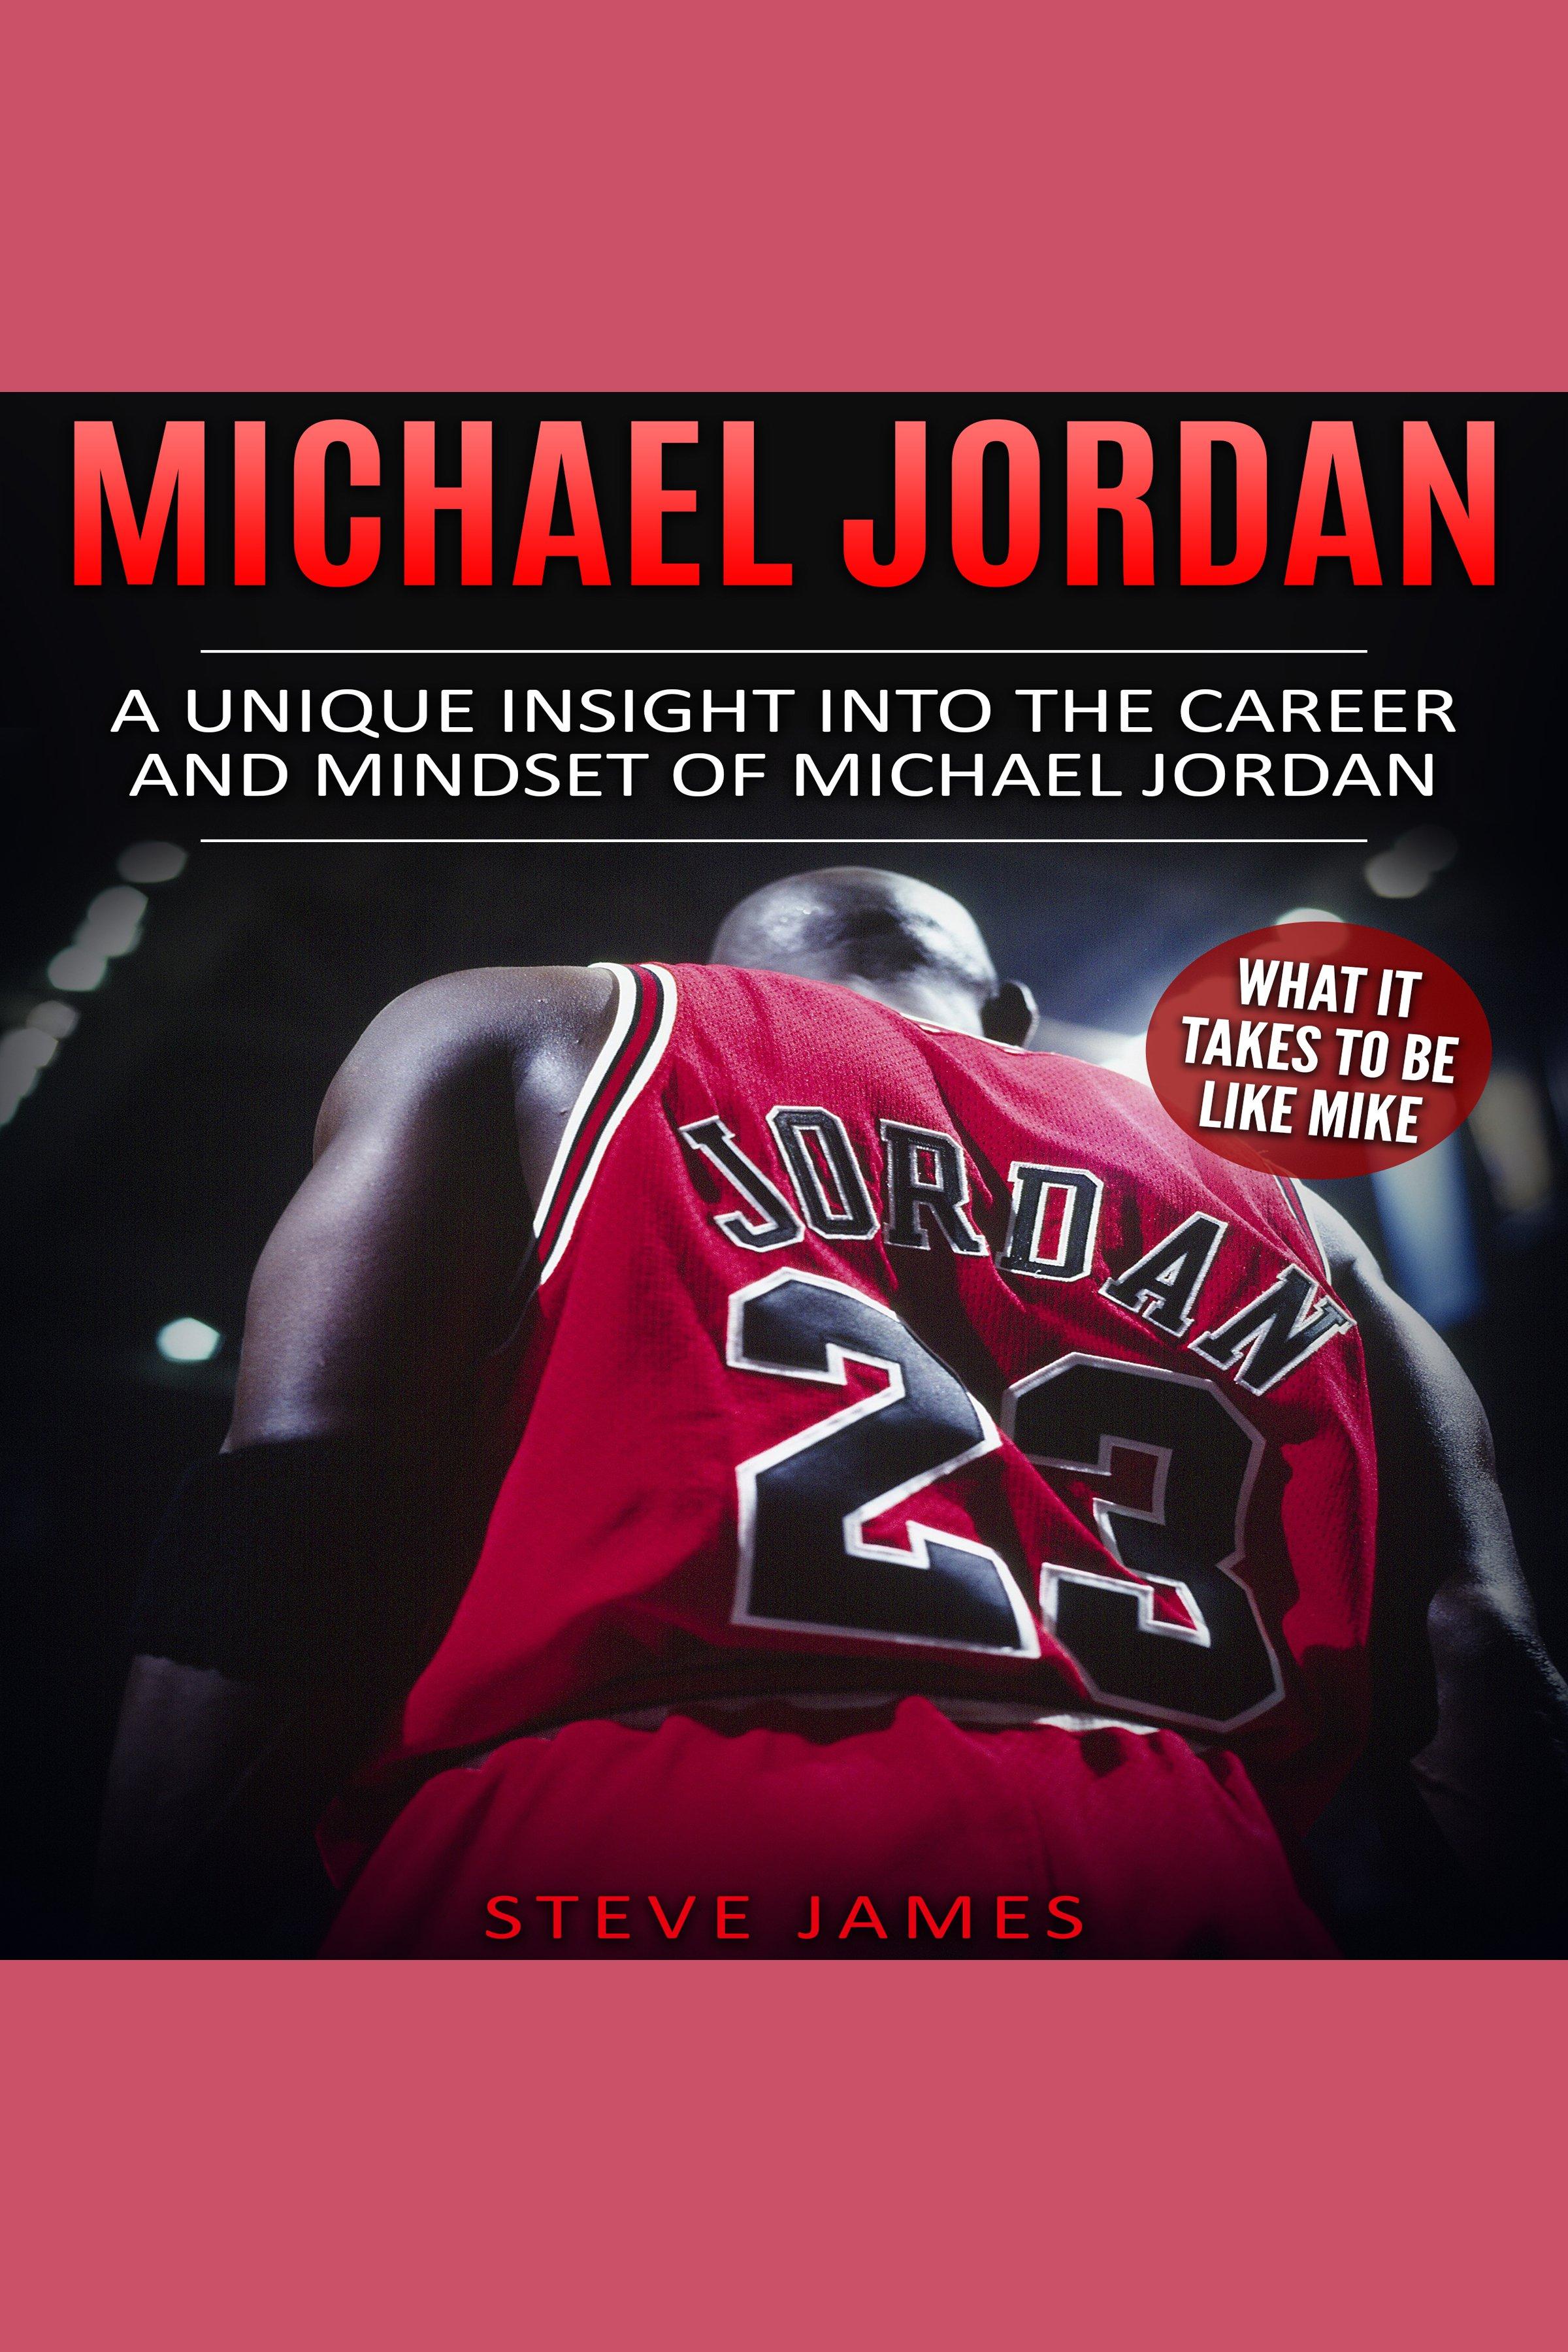 Esta es la portada del audiolibro Michael Jordan